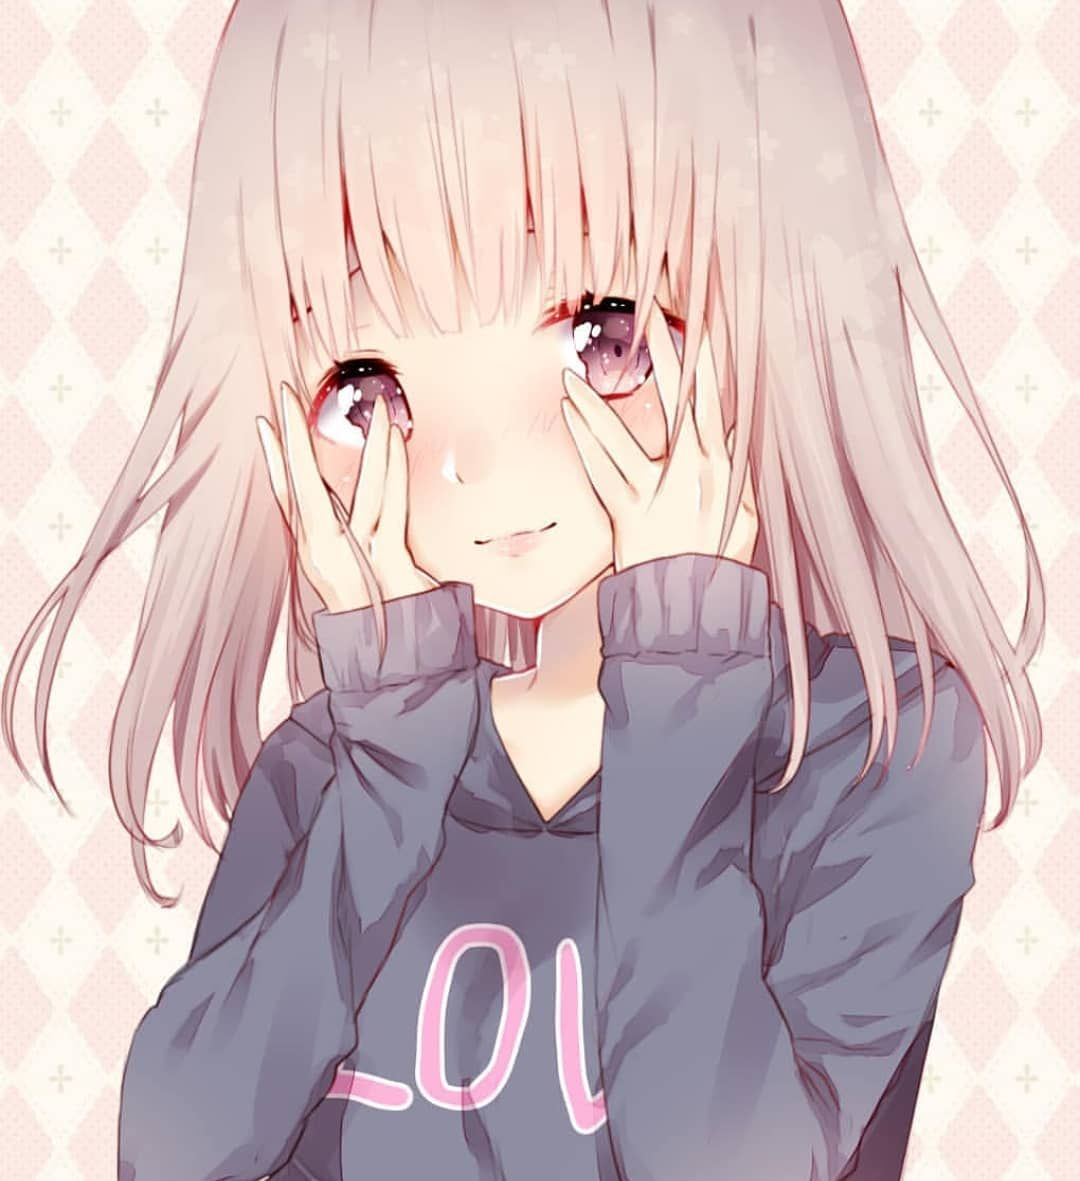 Anime Animegirl Kawaiigirl Kawaii Otaku Cute Pink Blue Eye